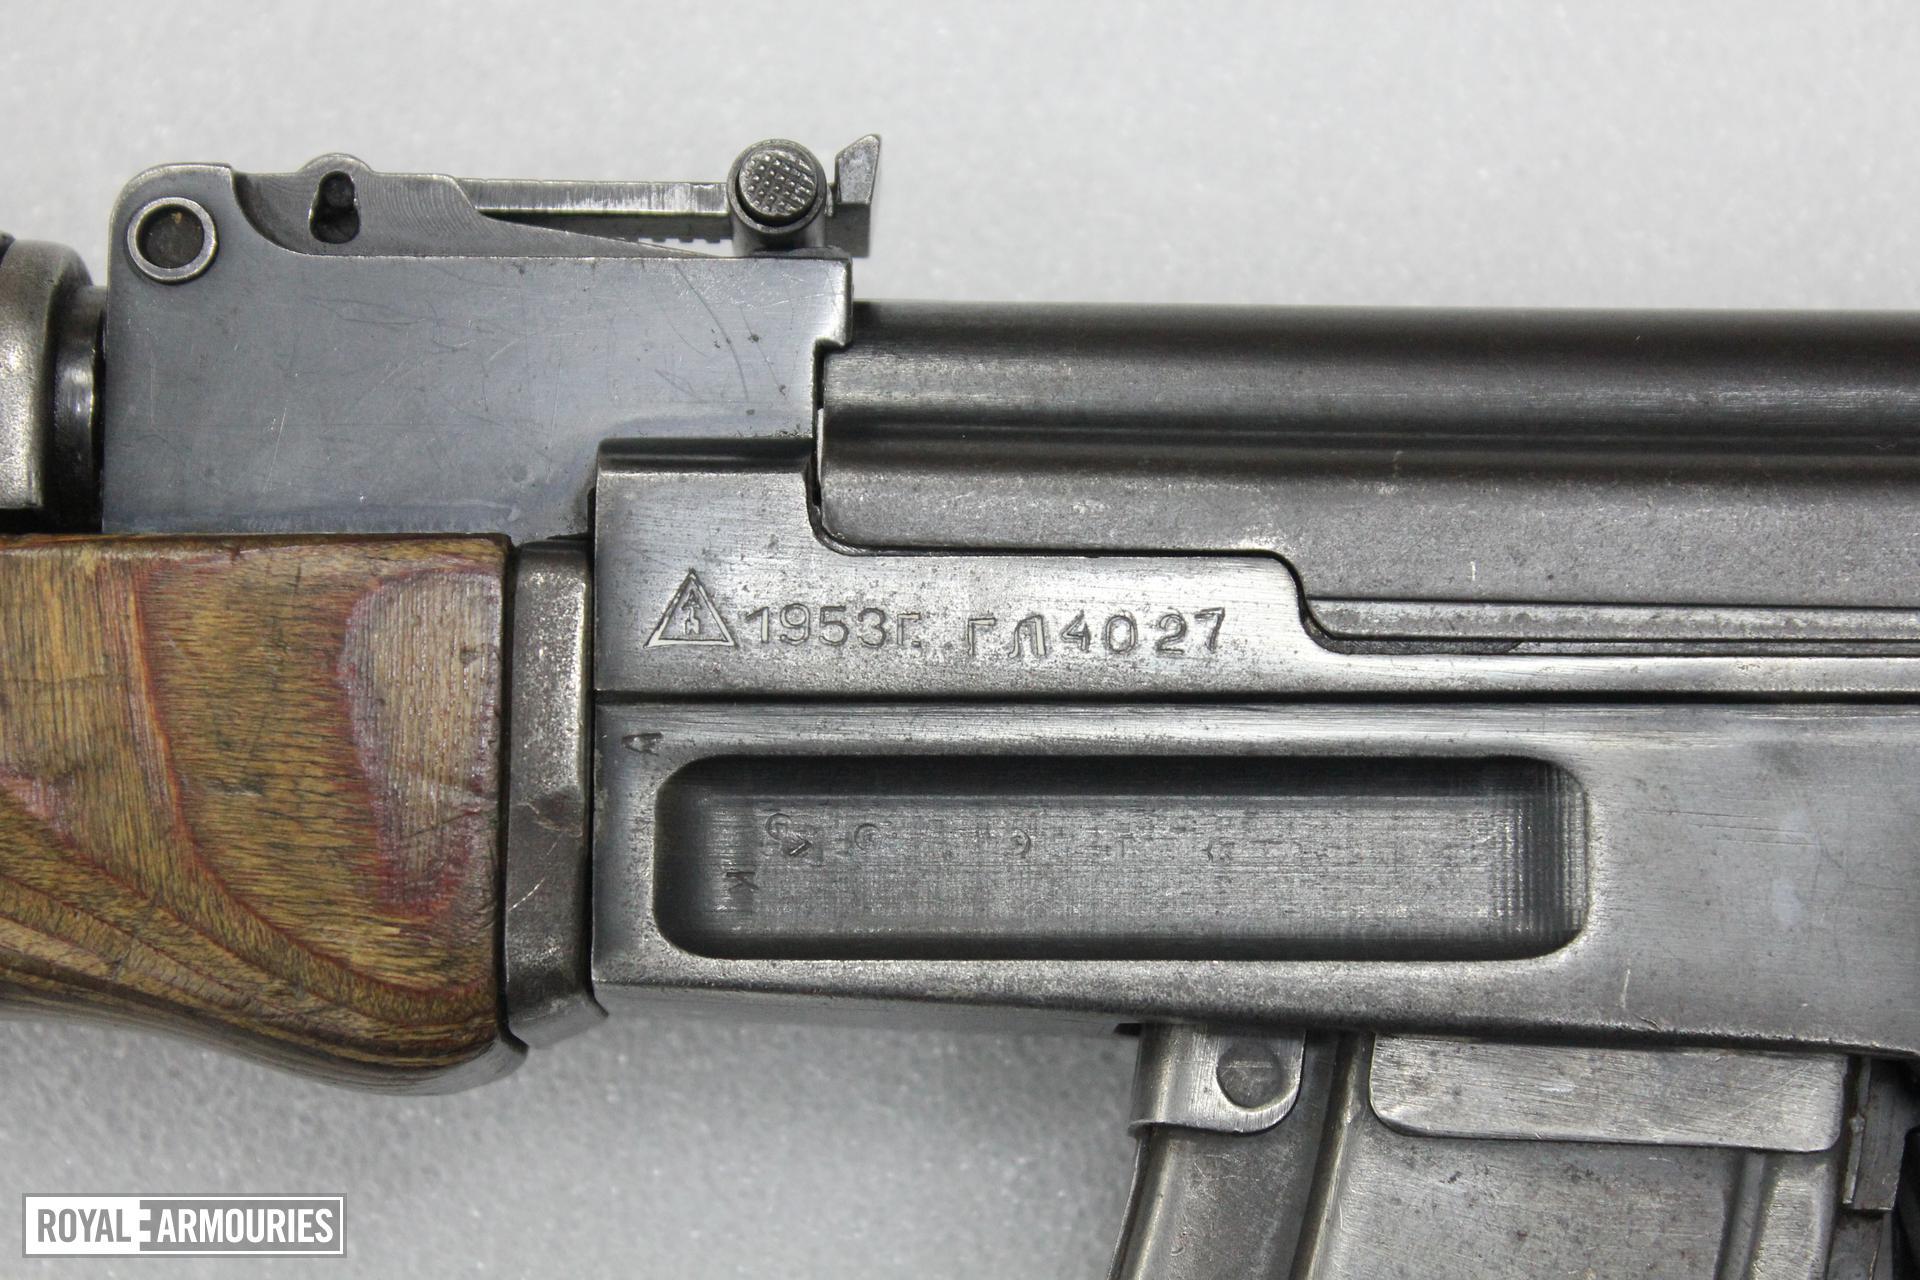 Closeup on trunnion markings